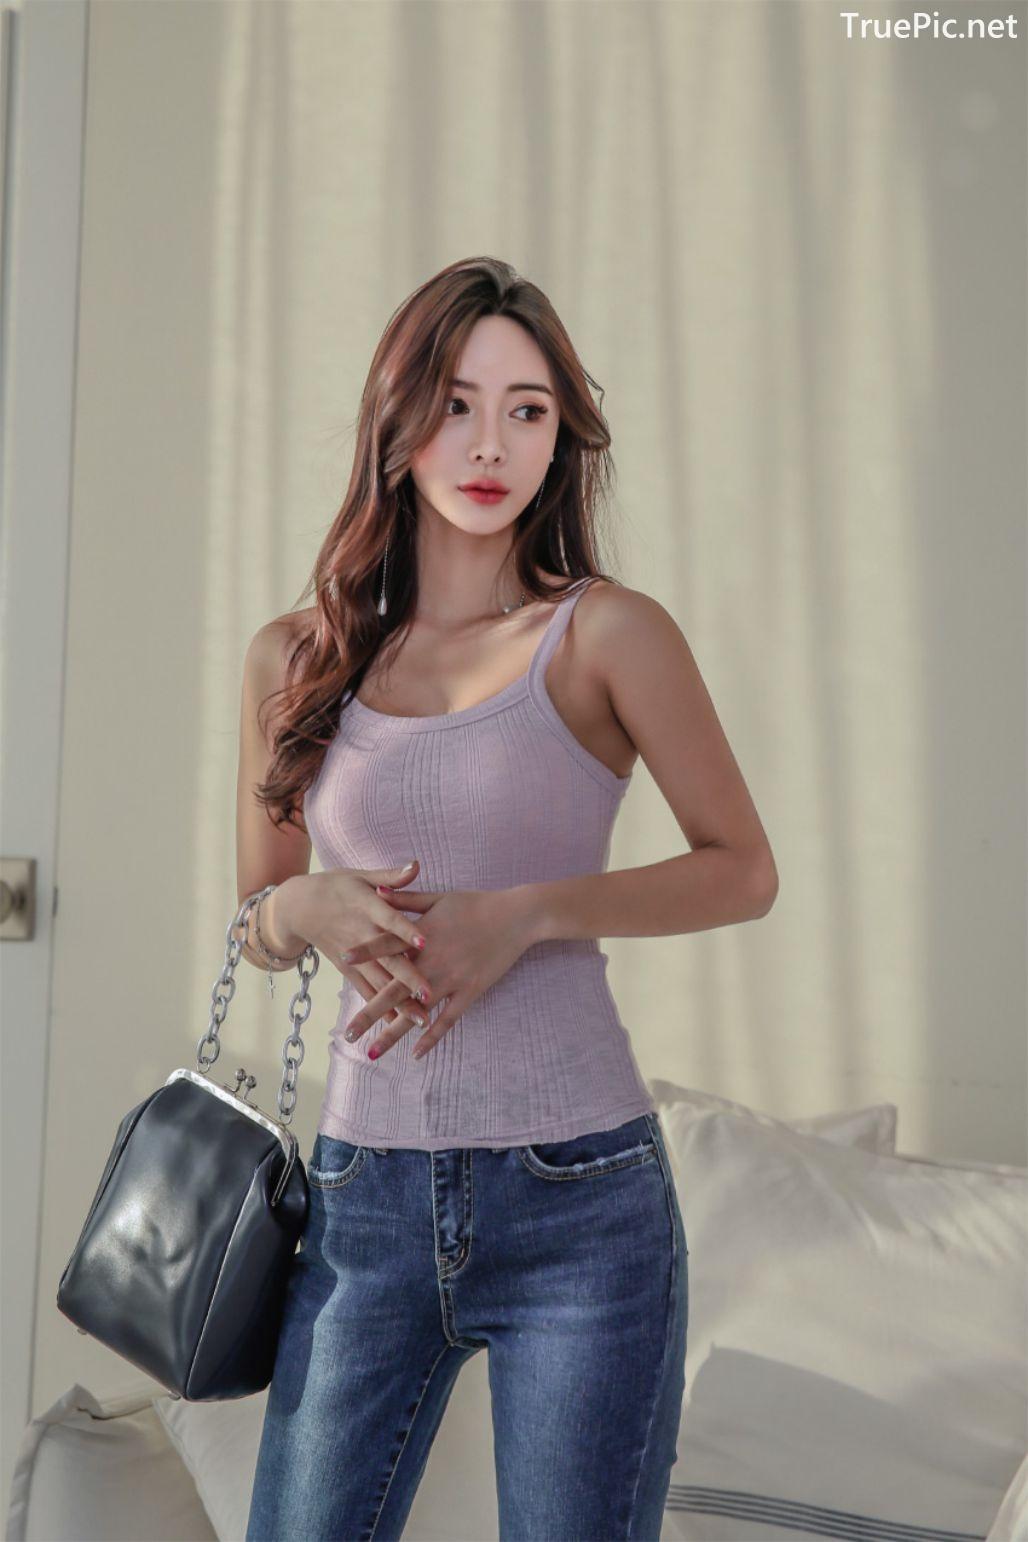 Image-Korean-Fashion-Model-Kim-Bo-Ram-Jeans-Set-Collection-TruePic.net- Picture-8